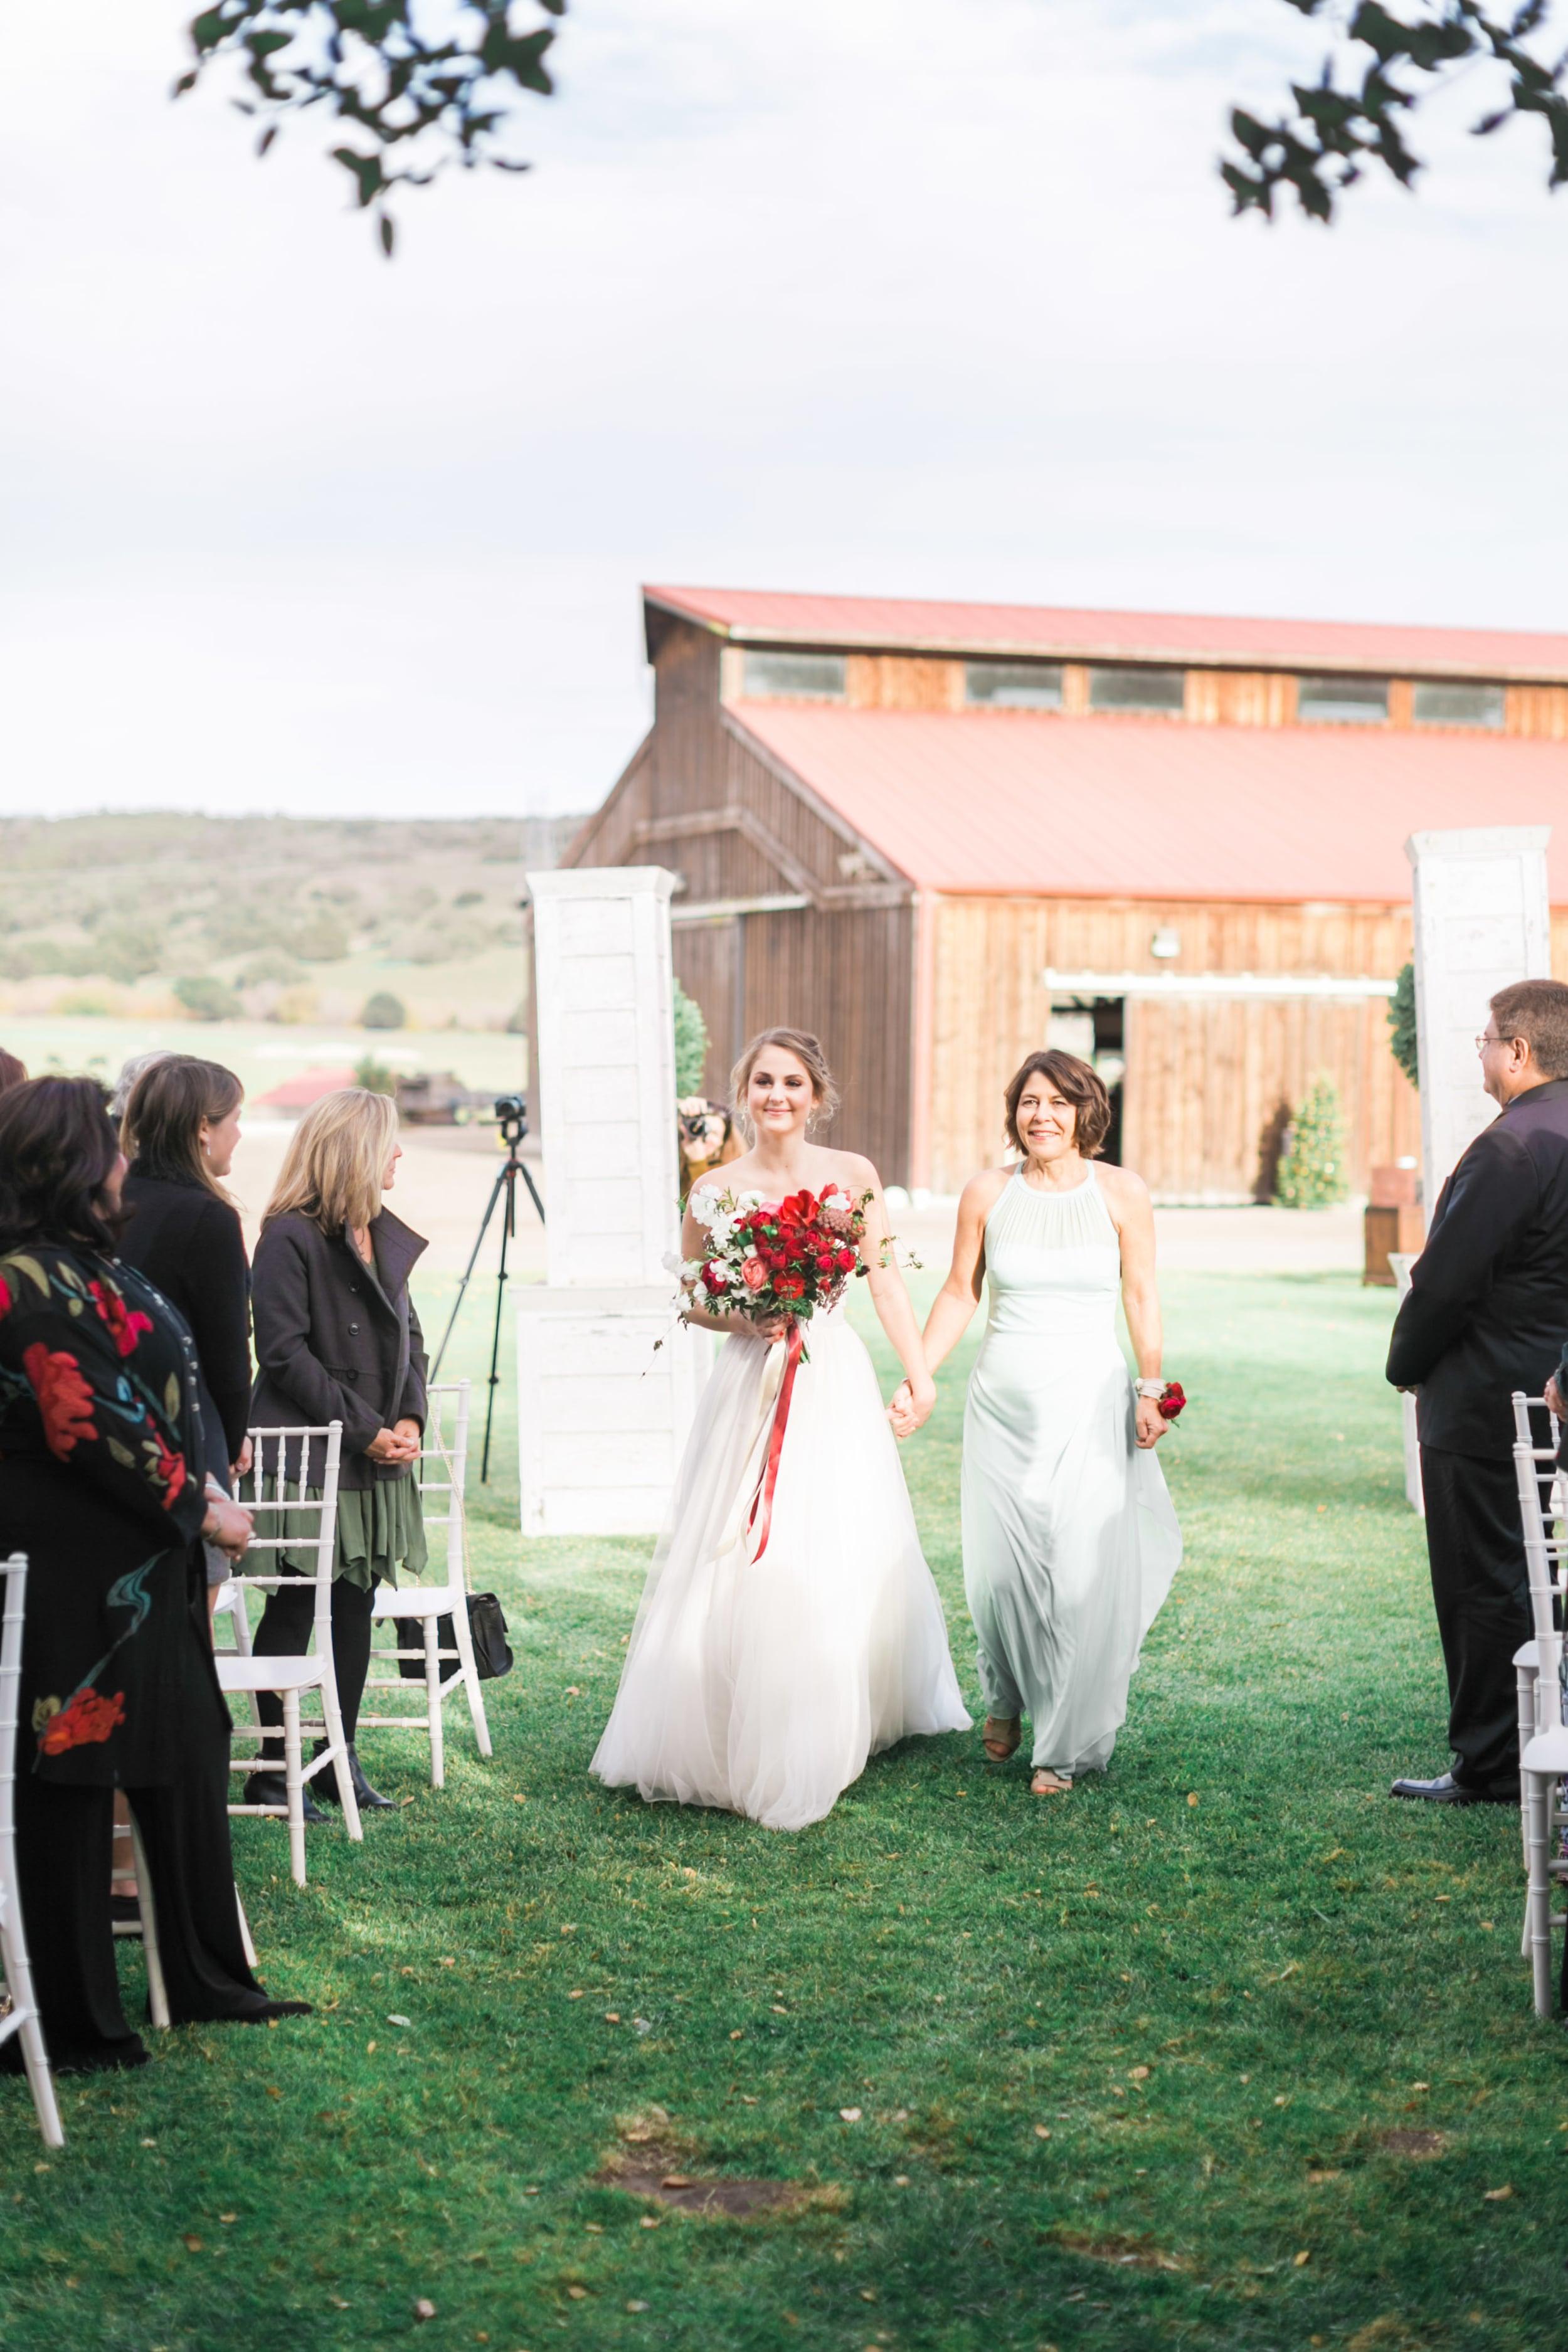 Natalie_Schutt_Photography_Winter_Wedding_San_Luis_Obispo-102.jpg